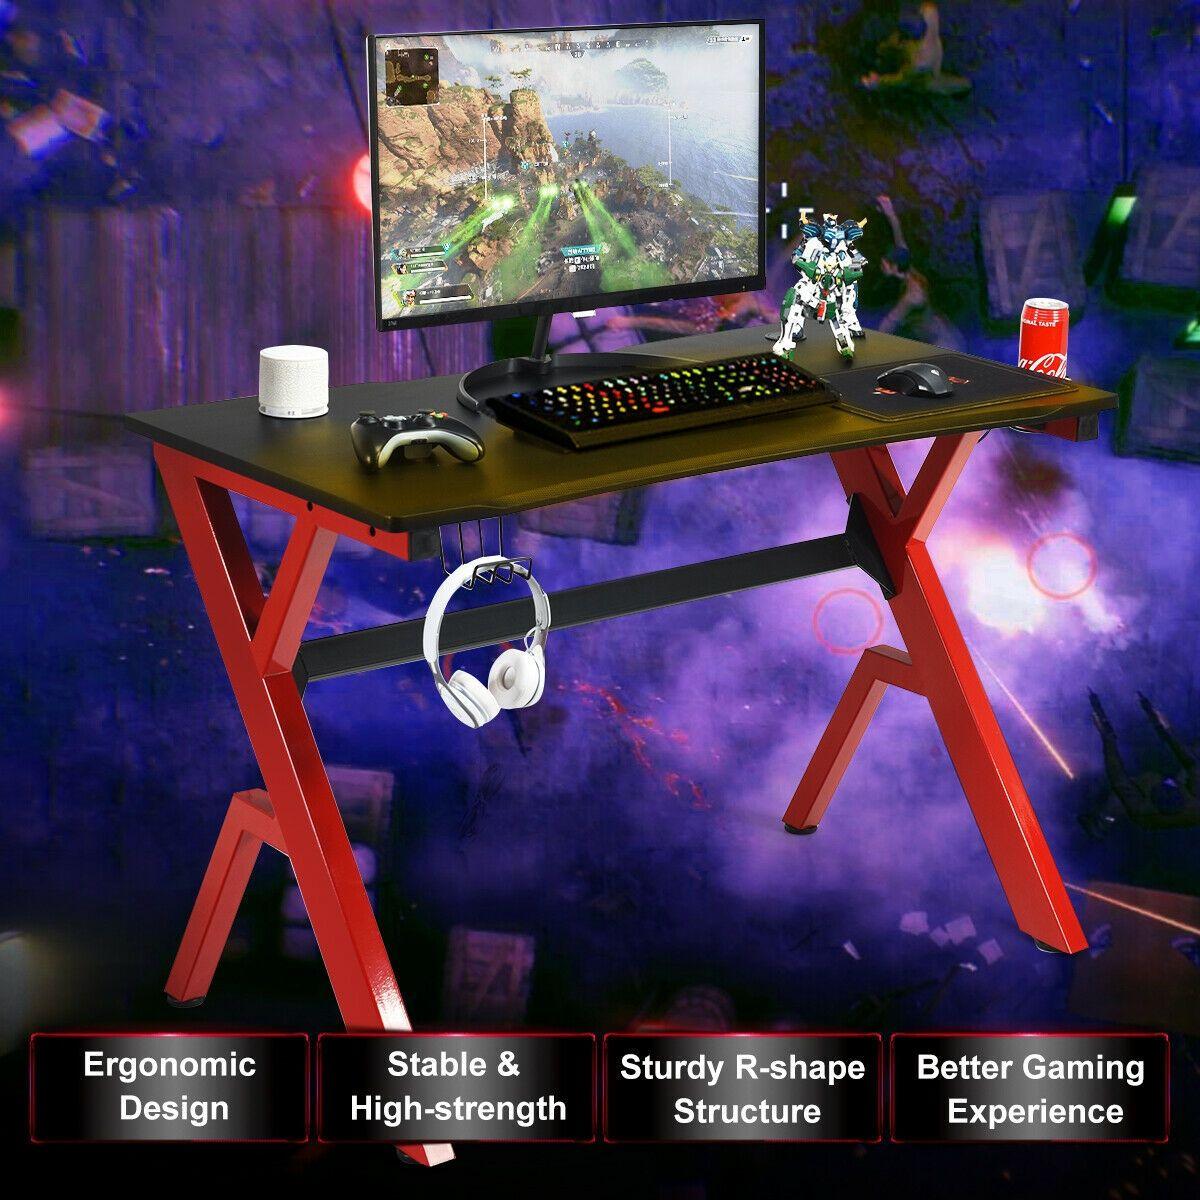 Headphone Mouse Pad & Cup Holder Storage Gaming Desk #gamingdesk